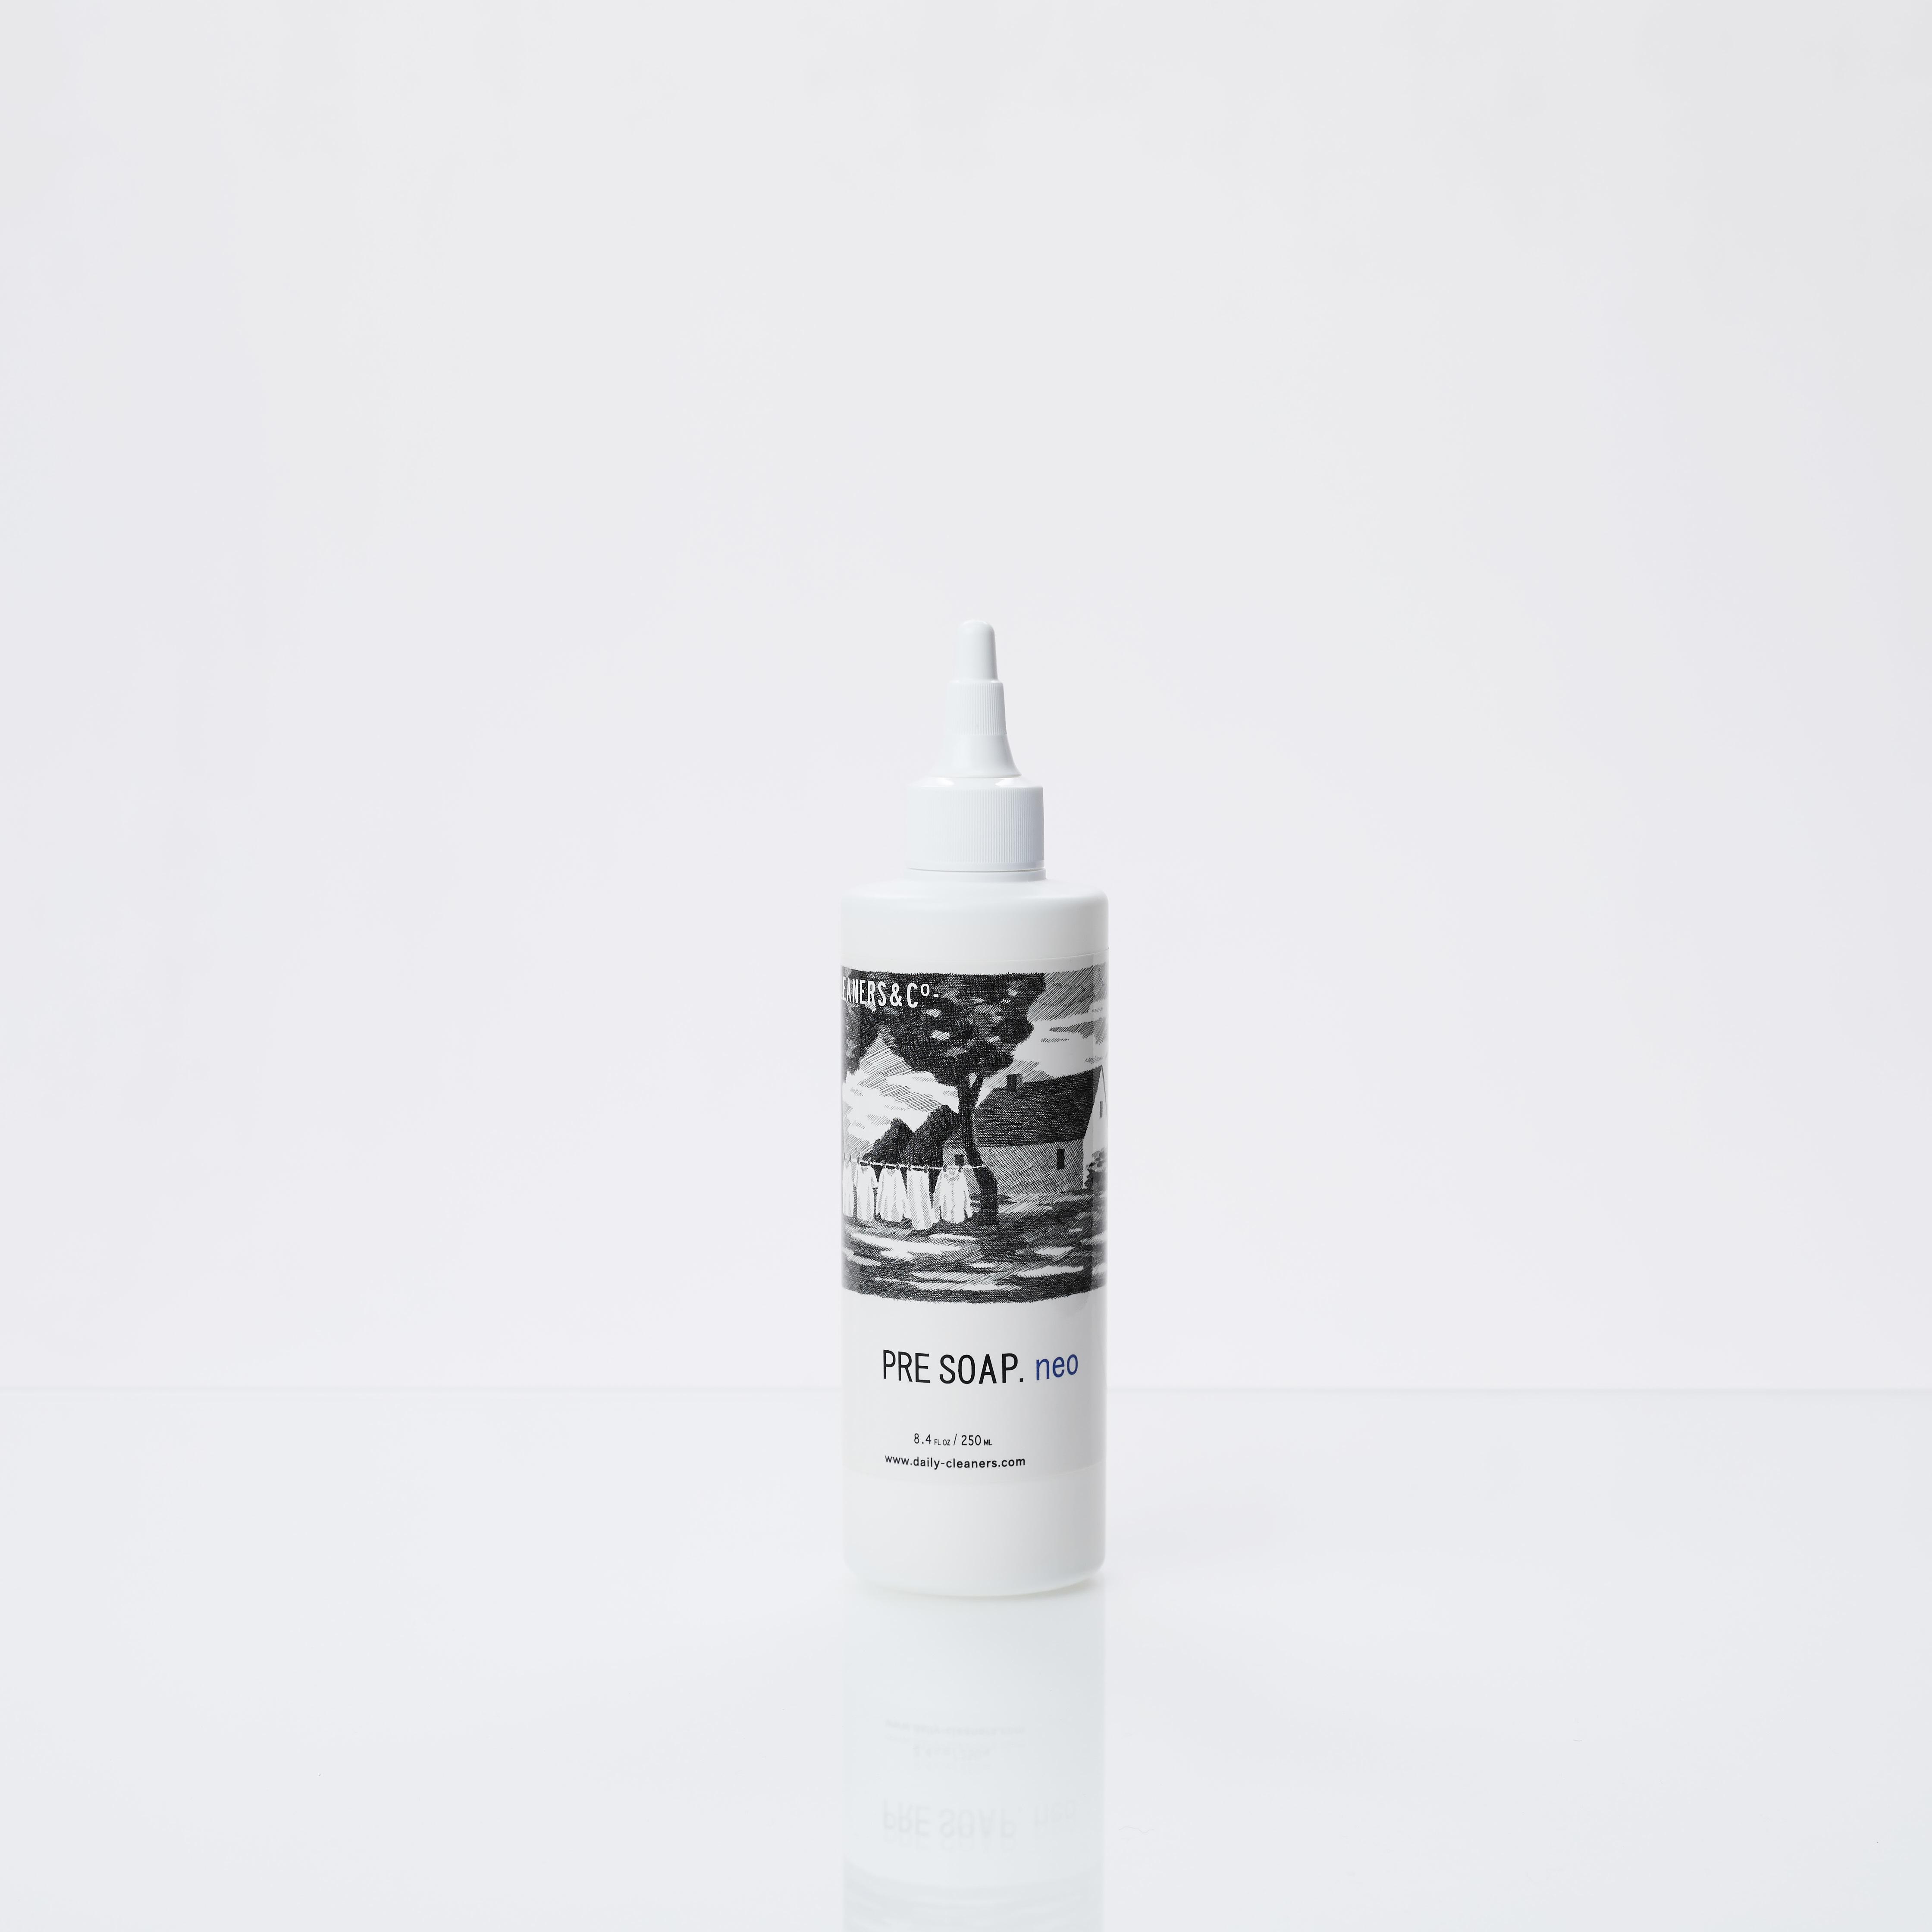 PRE SOAP_neo _ シミ抜き剤